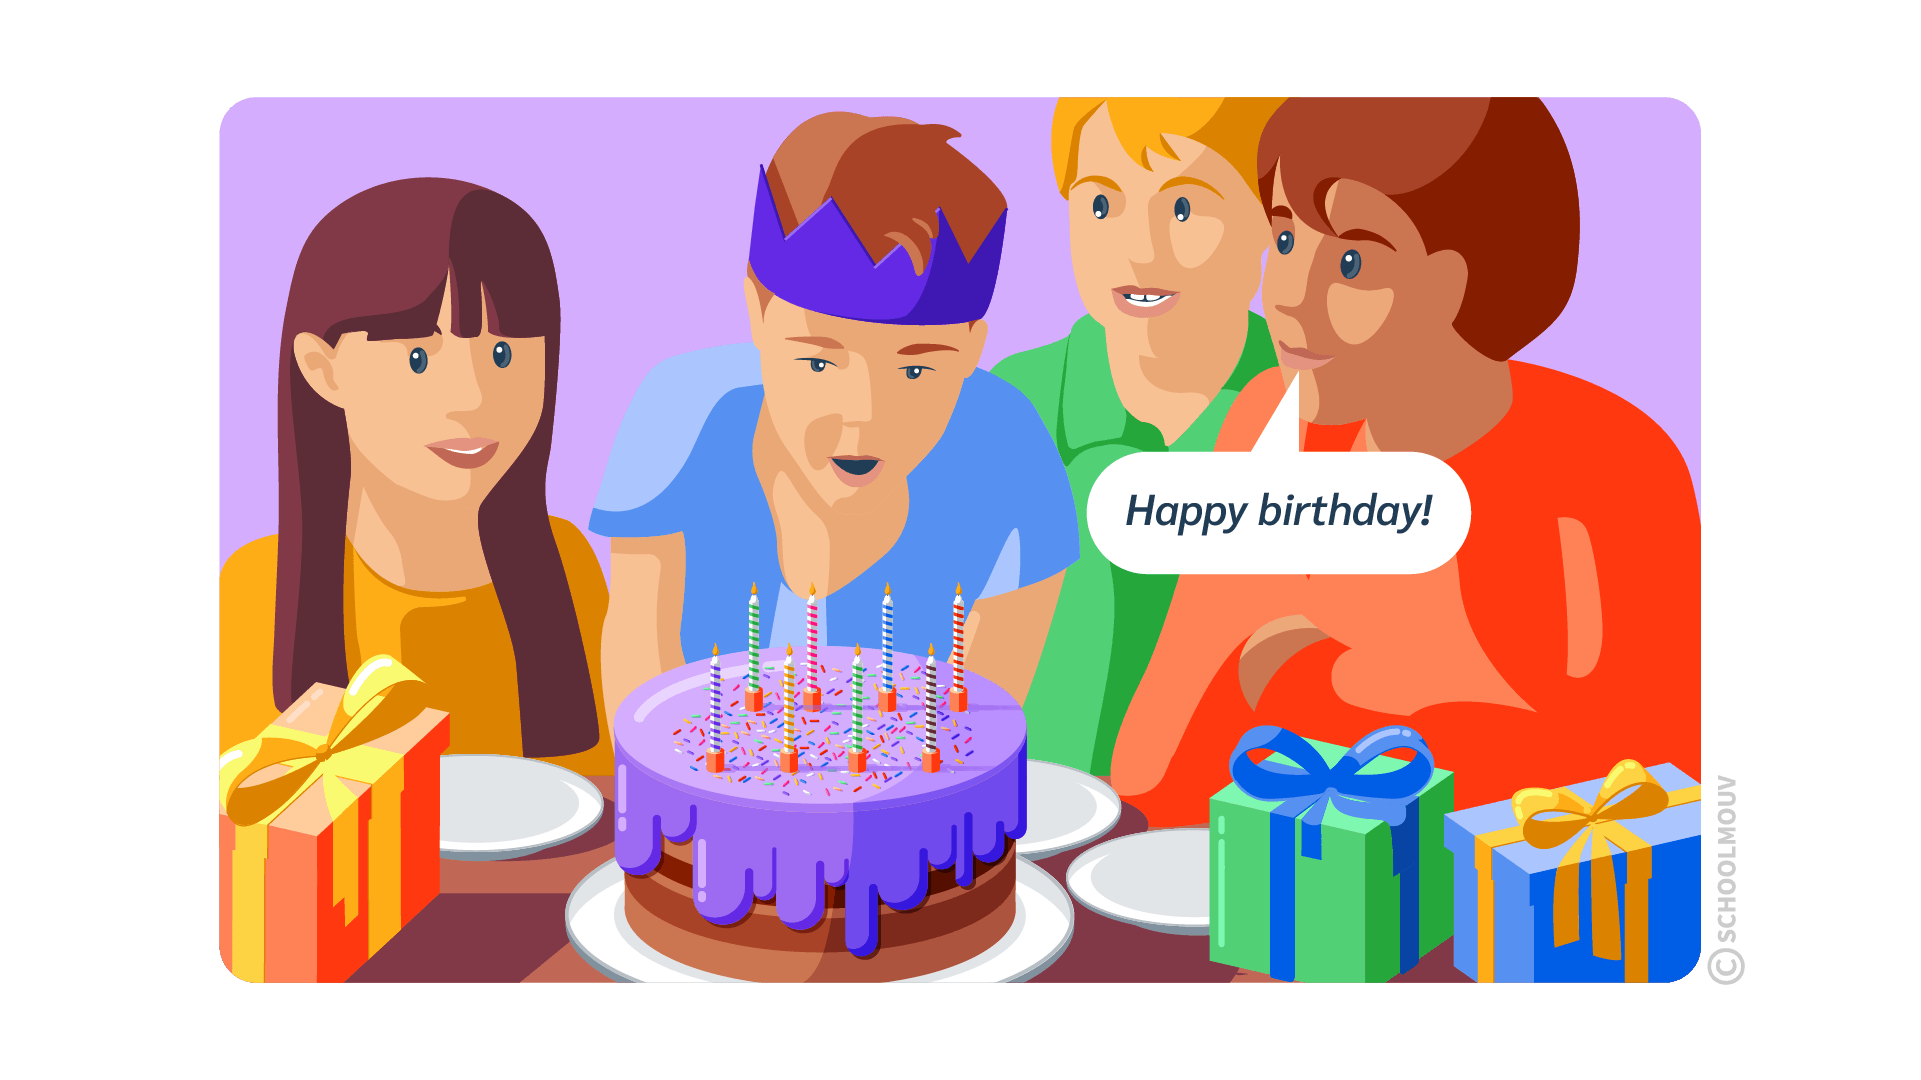 happy birthday joyeux anniversaire anglais